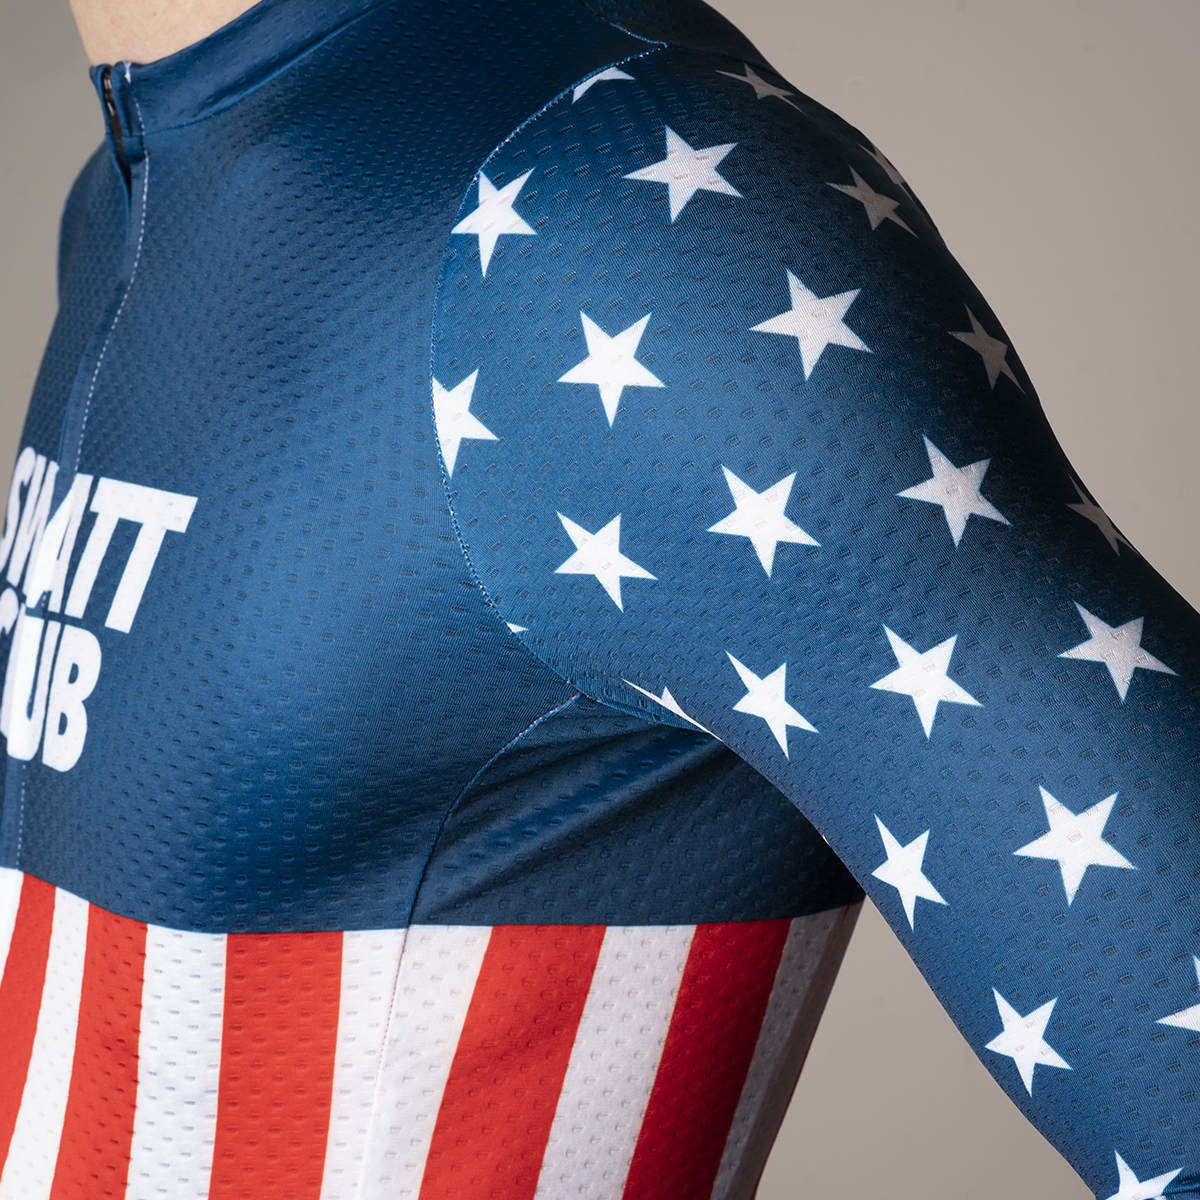 USA Aero Long Sleeve cycling jersey